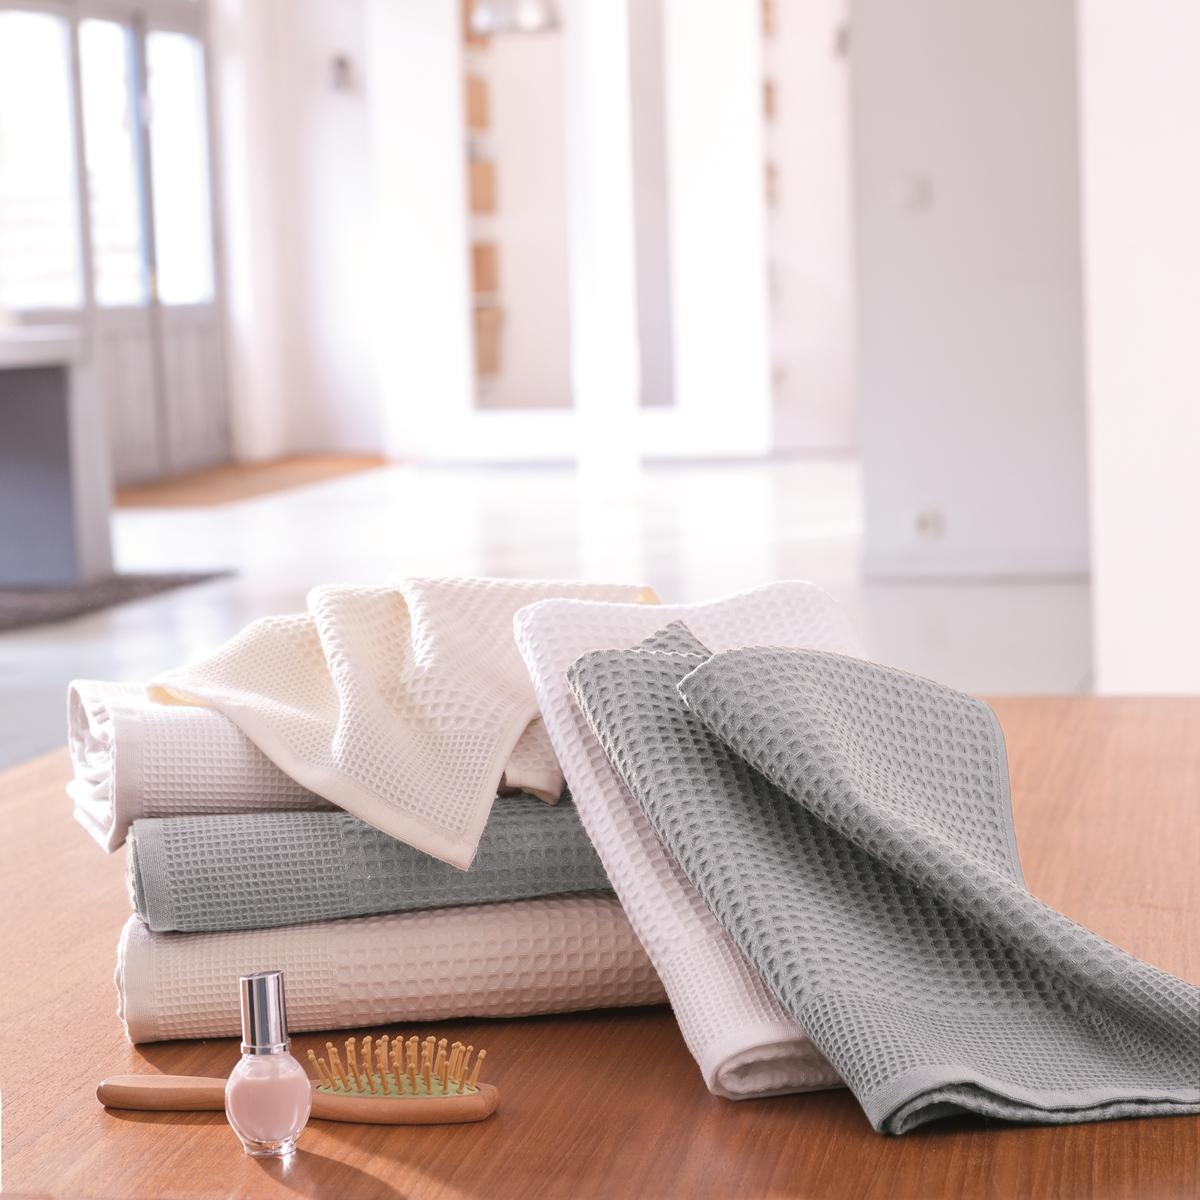 serviette de toilette nid d abeille stunning serviette x nid duabeille blanc with serviette de. Black Bedroom Furniture Sets. Home Design Ideas